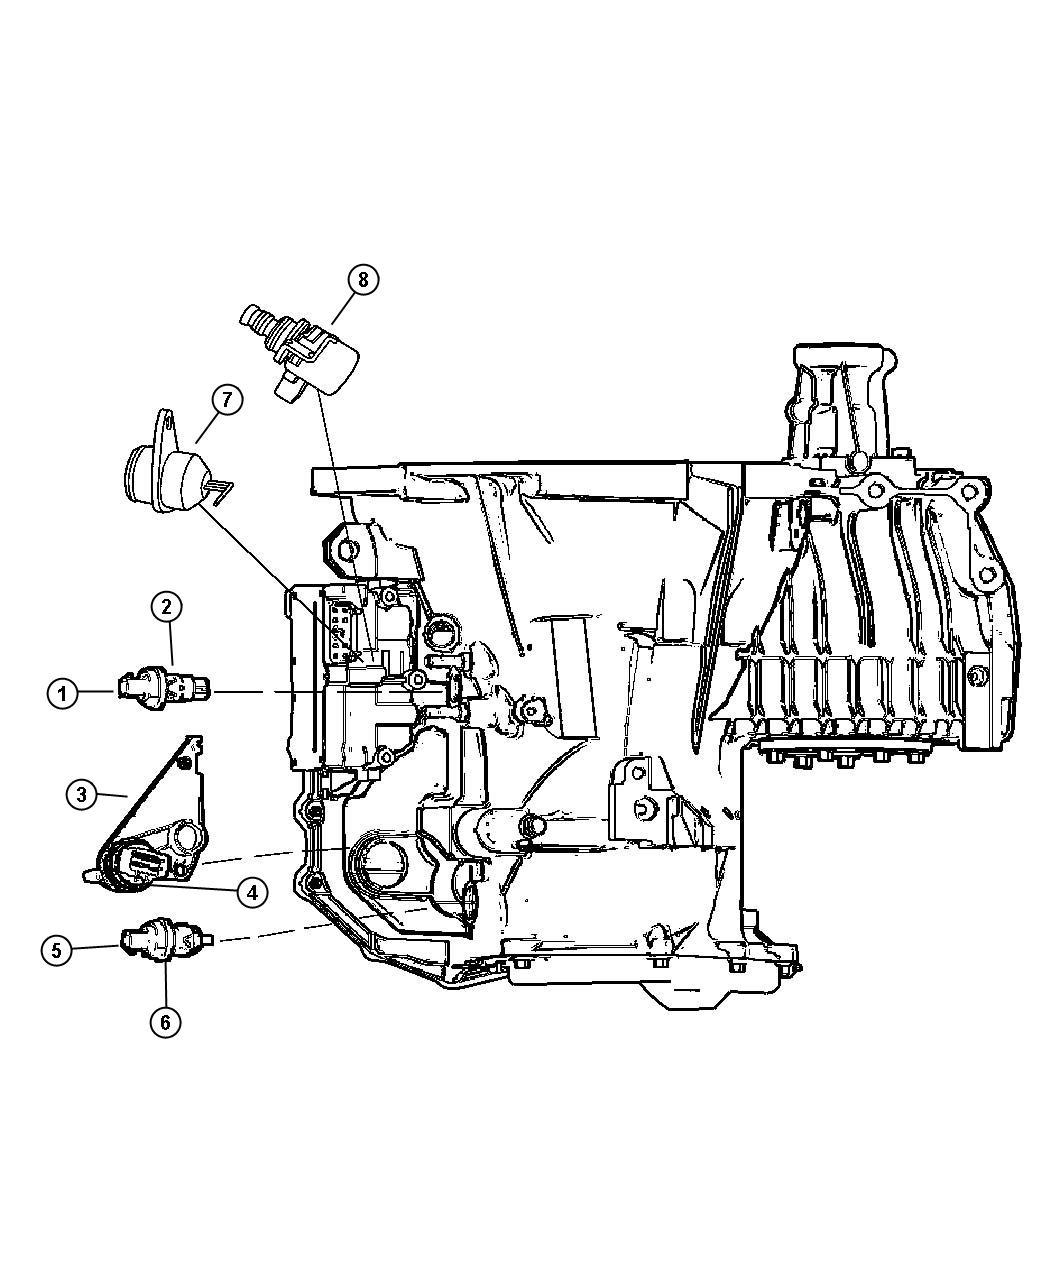 Dodge Charger Sensors Transmission 4 Spd Automatic